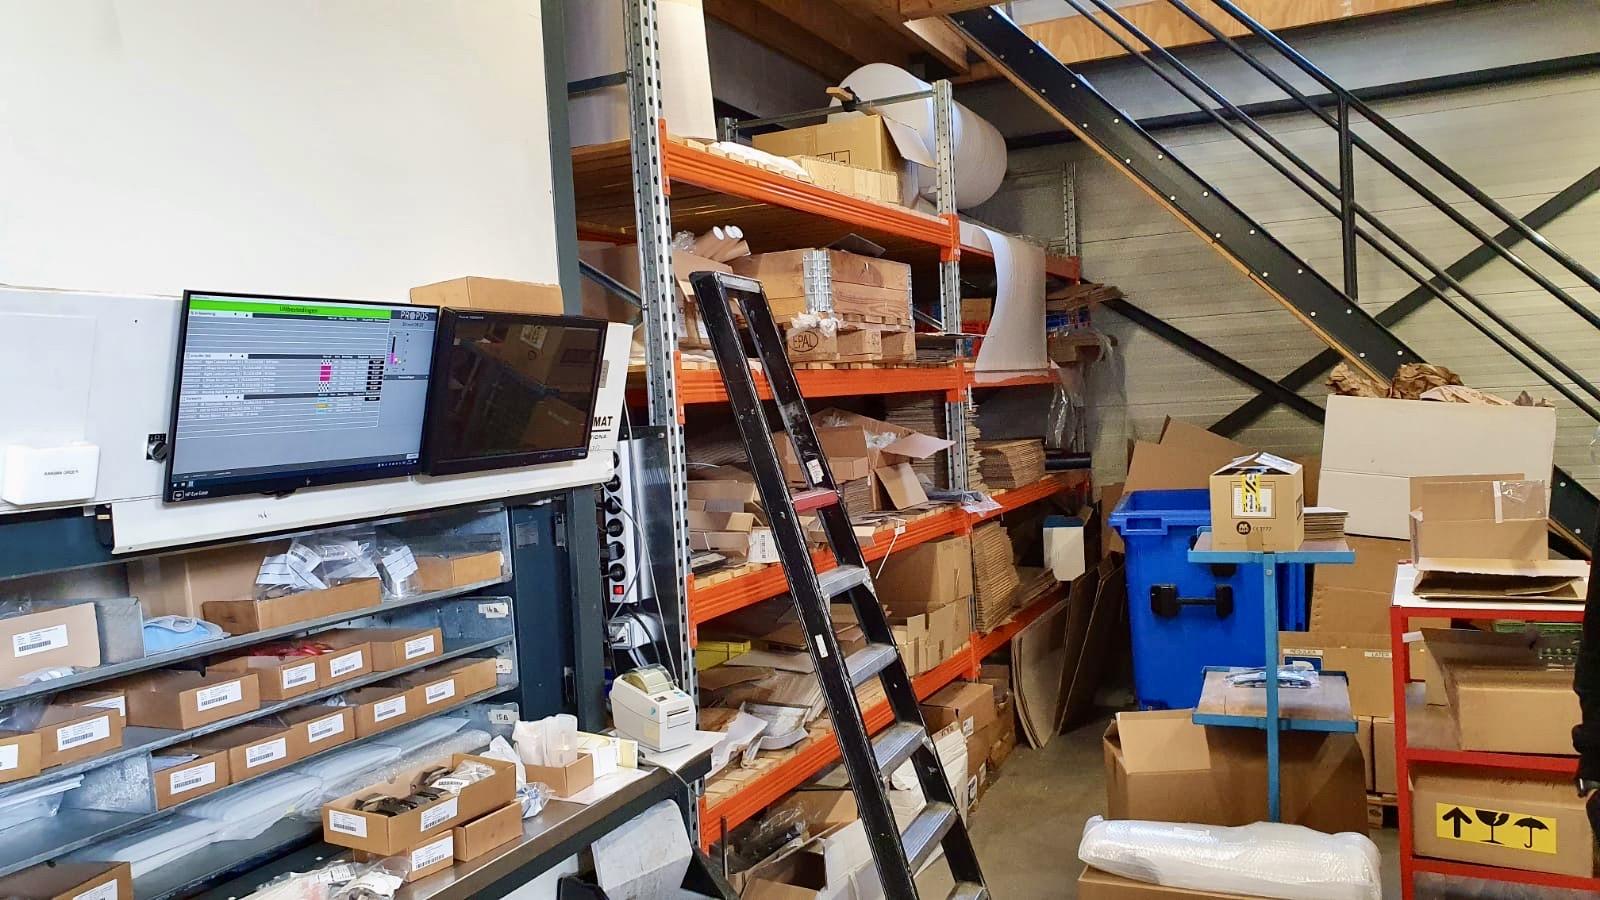 propos shop floor control bij SAM precision mkg-5 voorraad